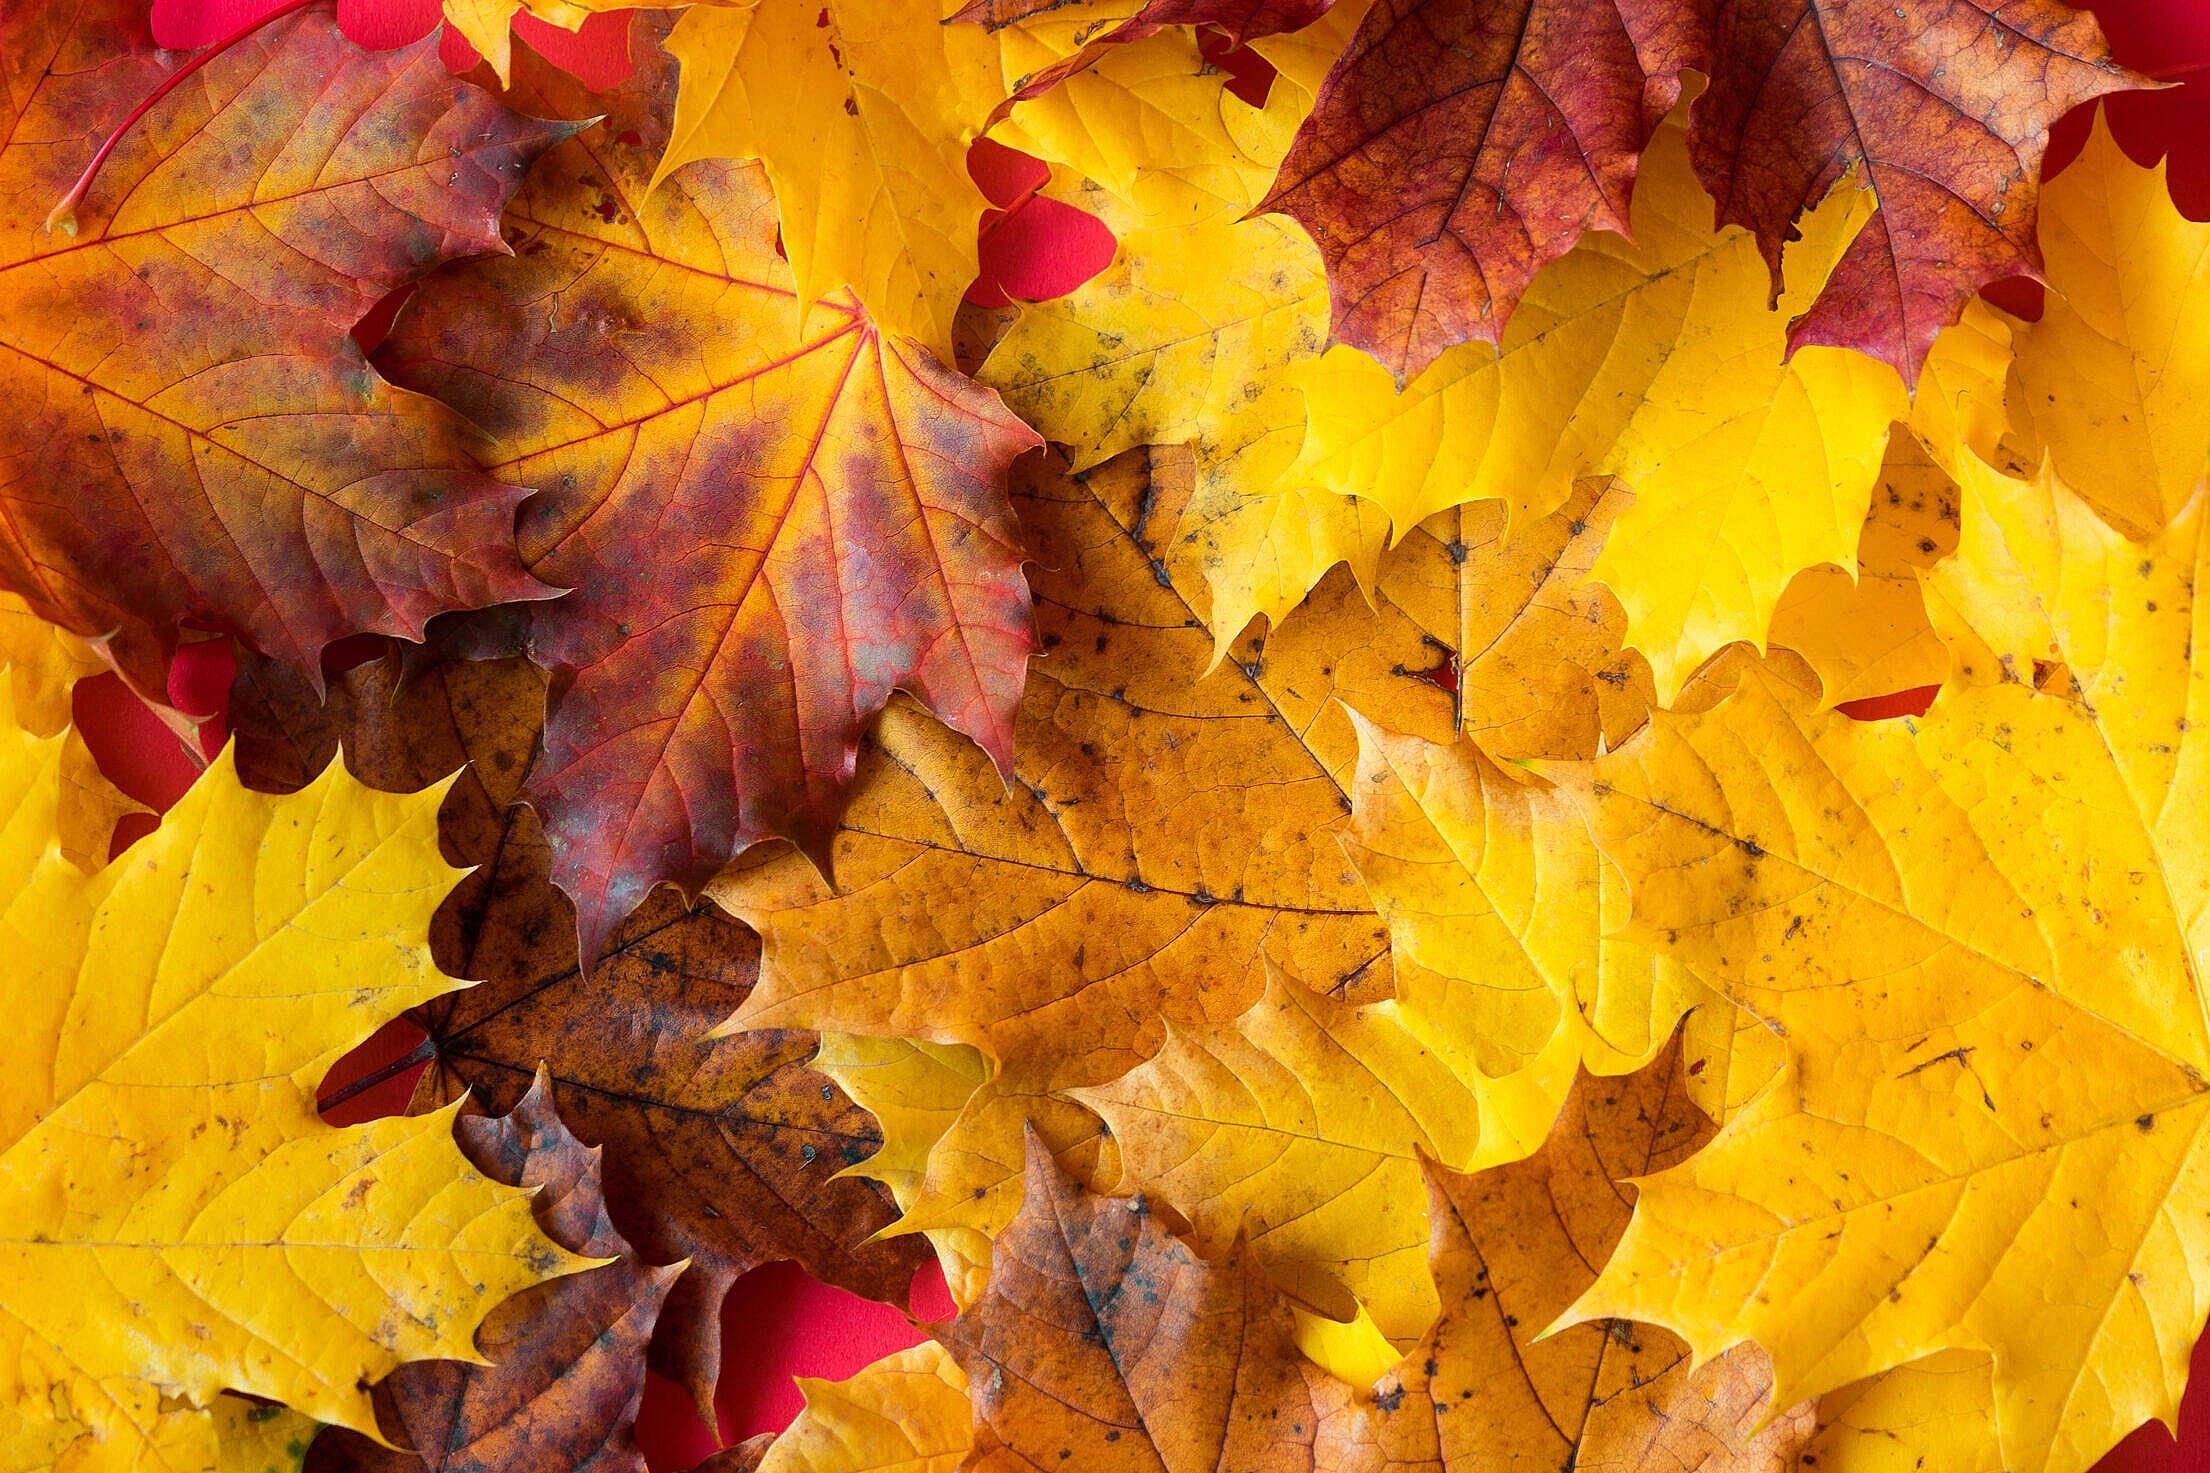 Fall Autumn Leaves Close Up Free Stock Photo